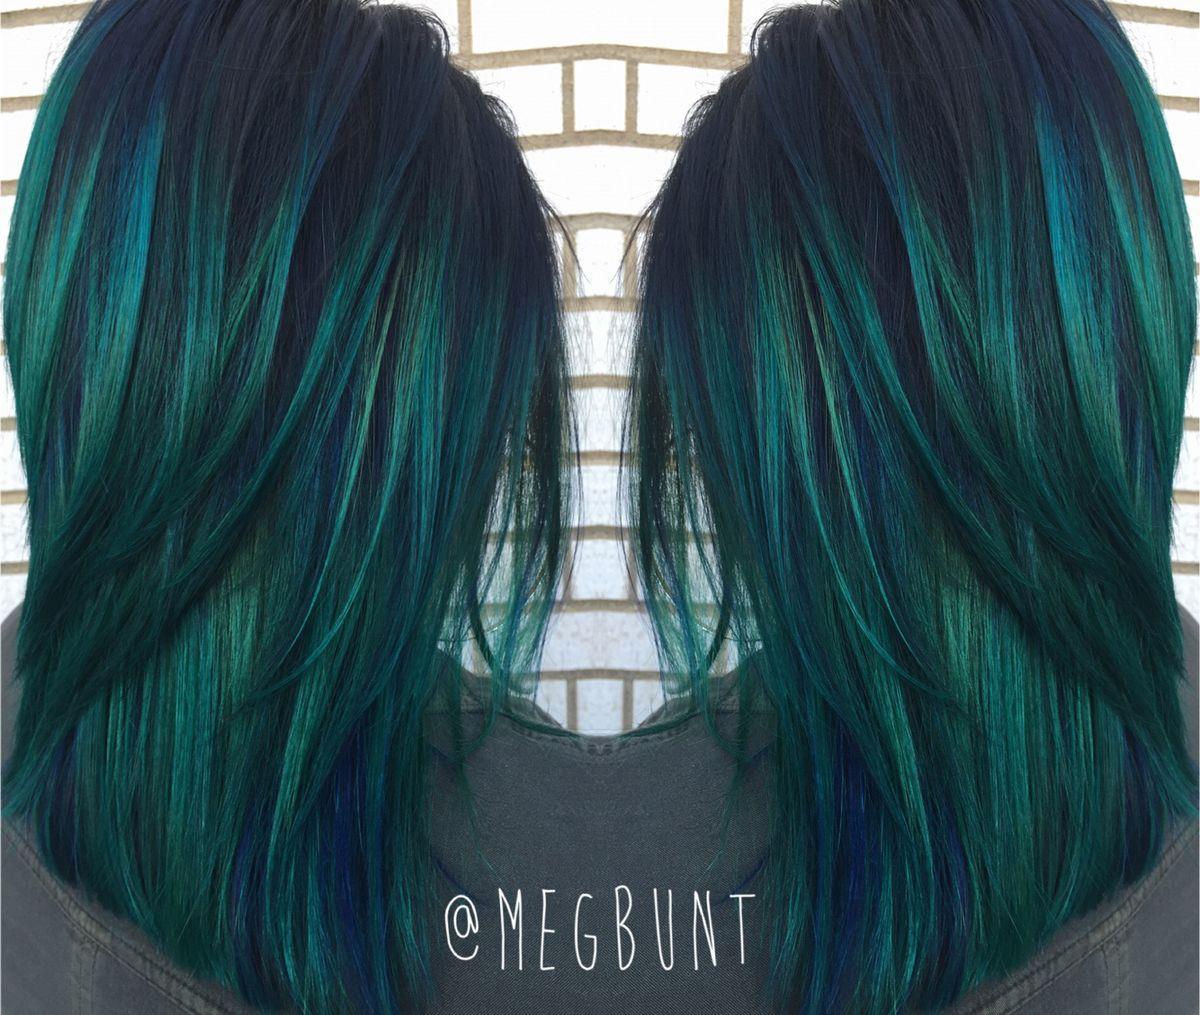 Oh how I miss my Pinterest worthy blue hair Iull definitely get